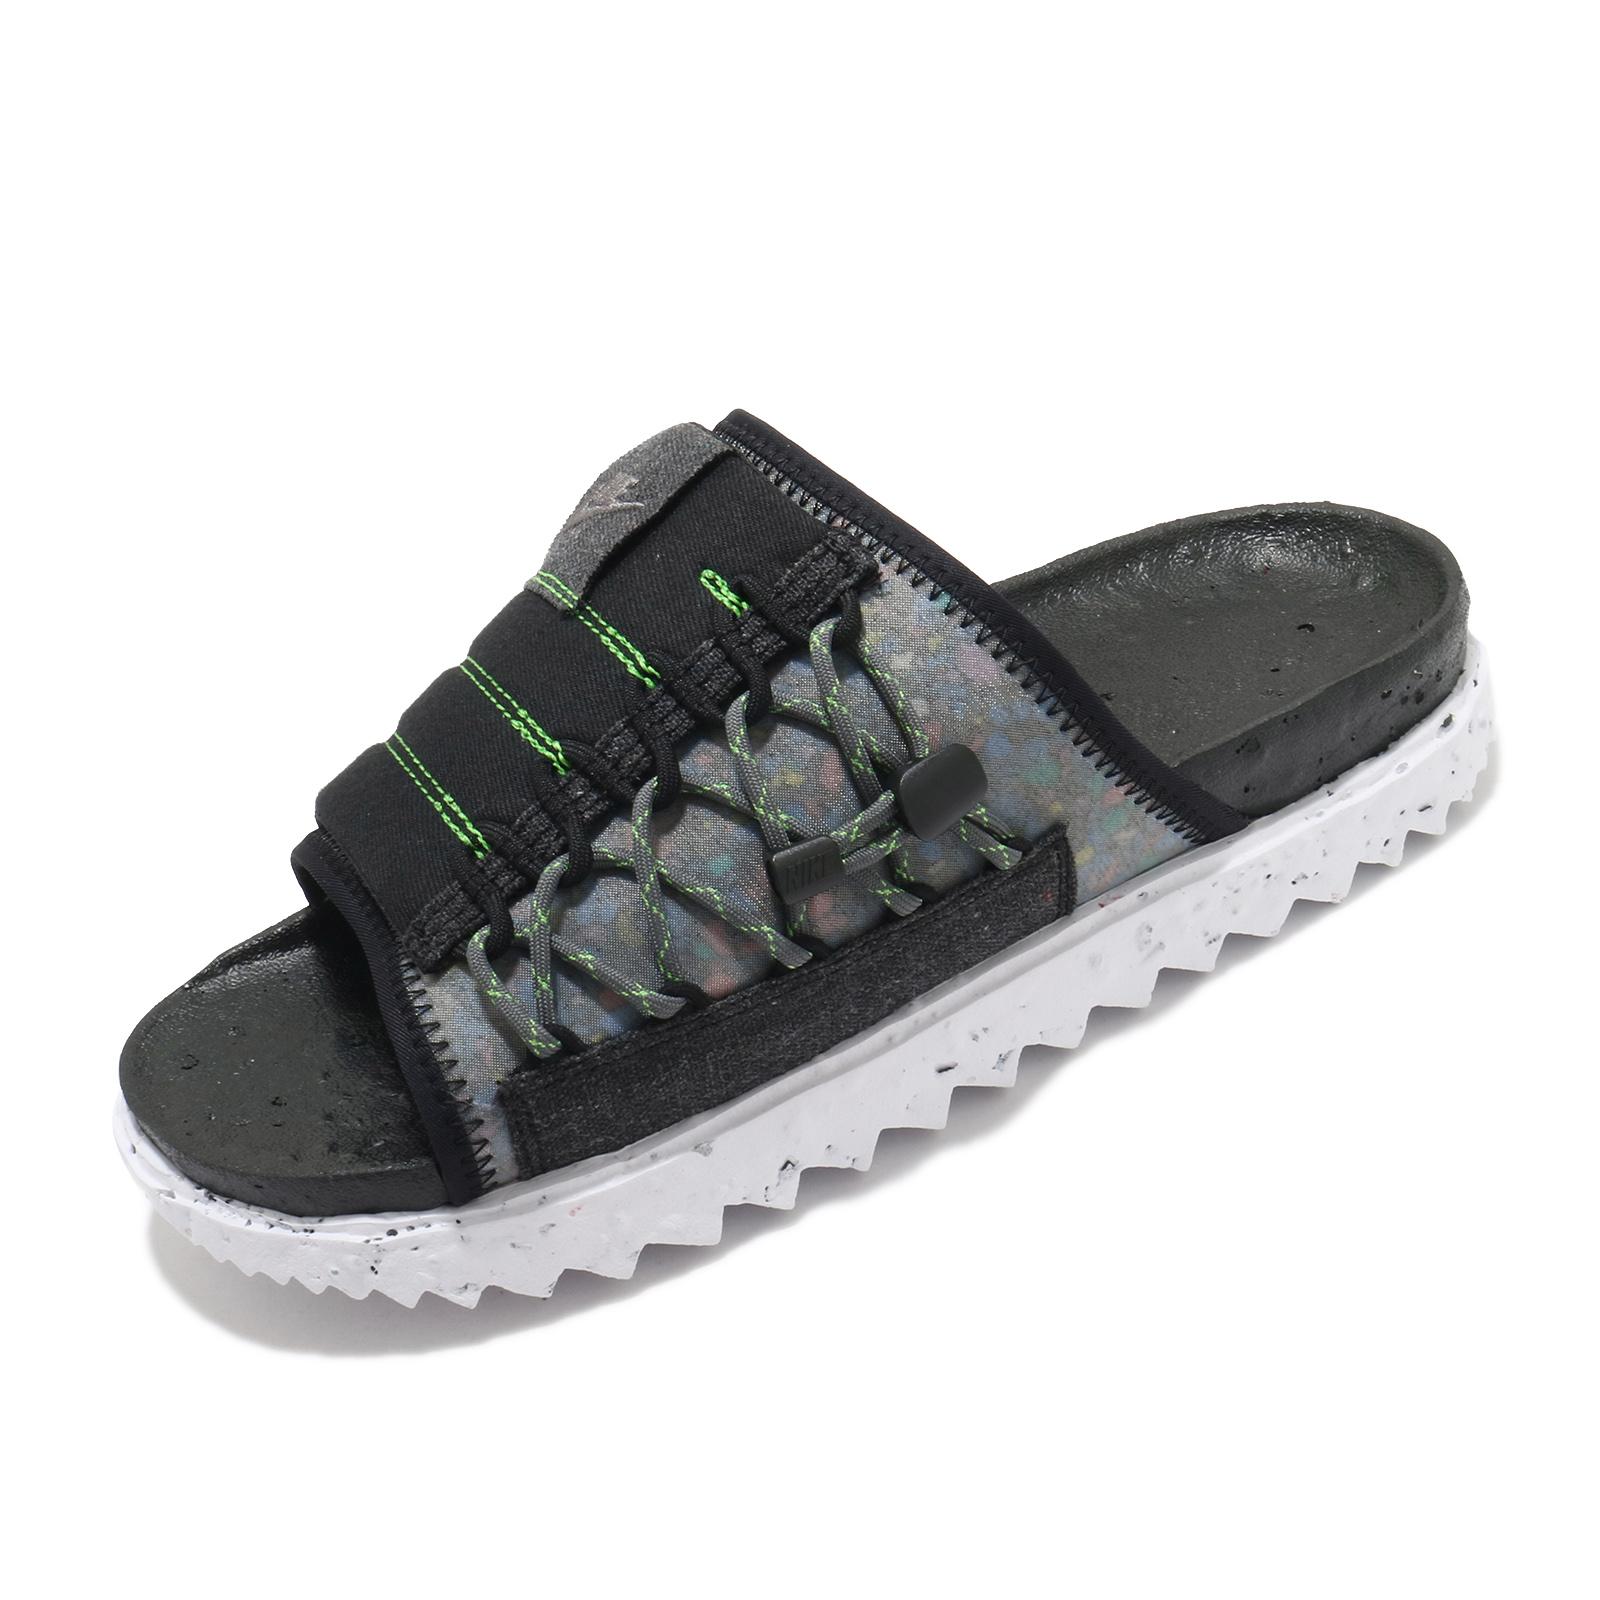 Nike 涼拖鞋 Asuna Crater Slide 回收材質 黑灰綠 男鞋 拖鞋 【ACS】 DJ4629-002